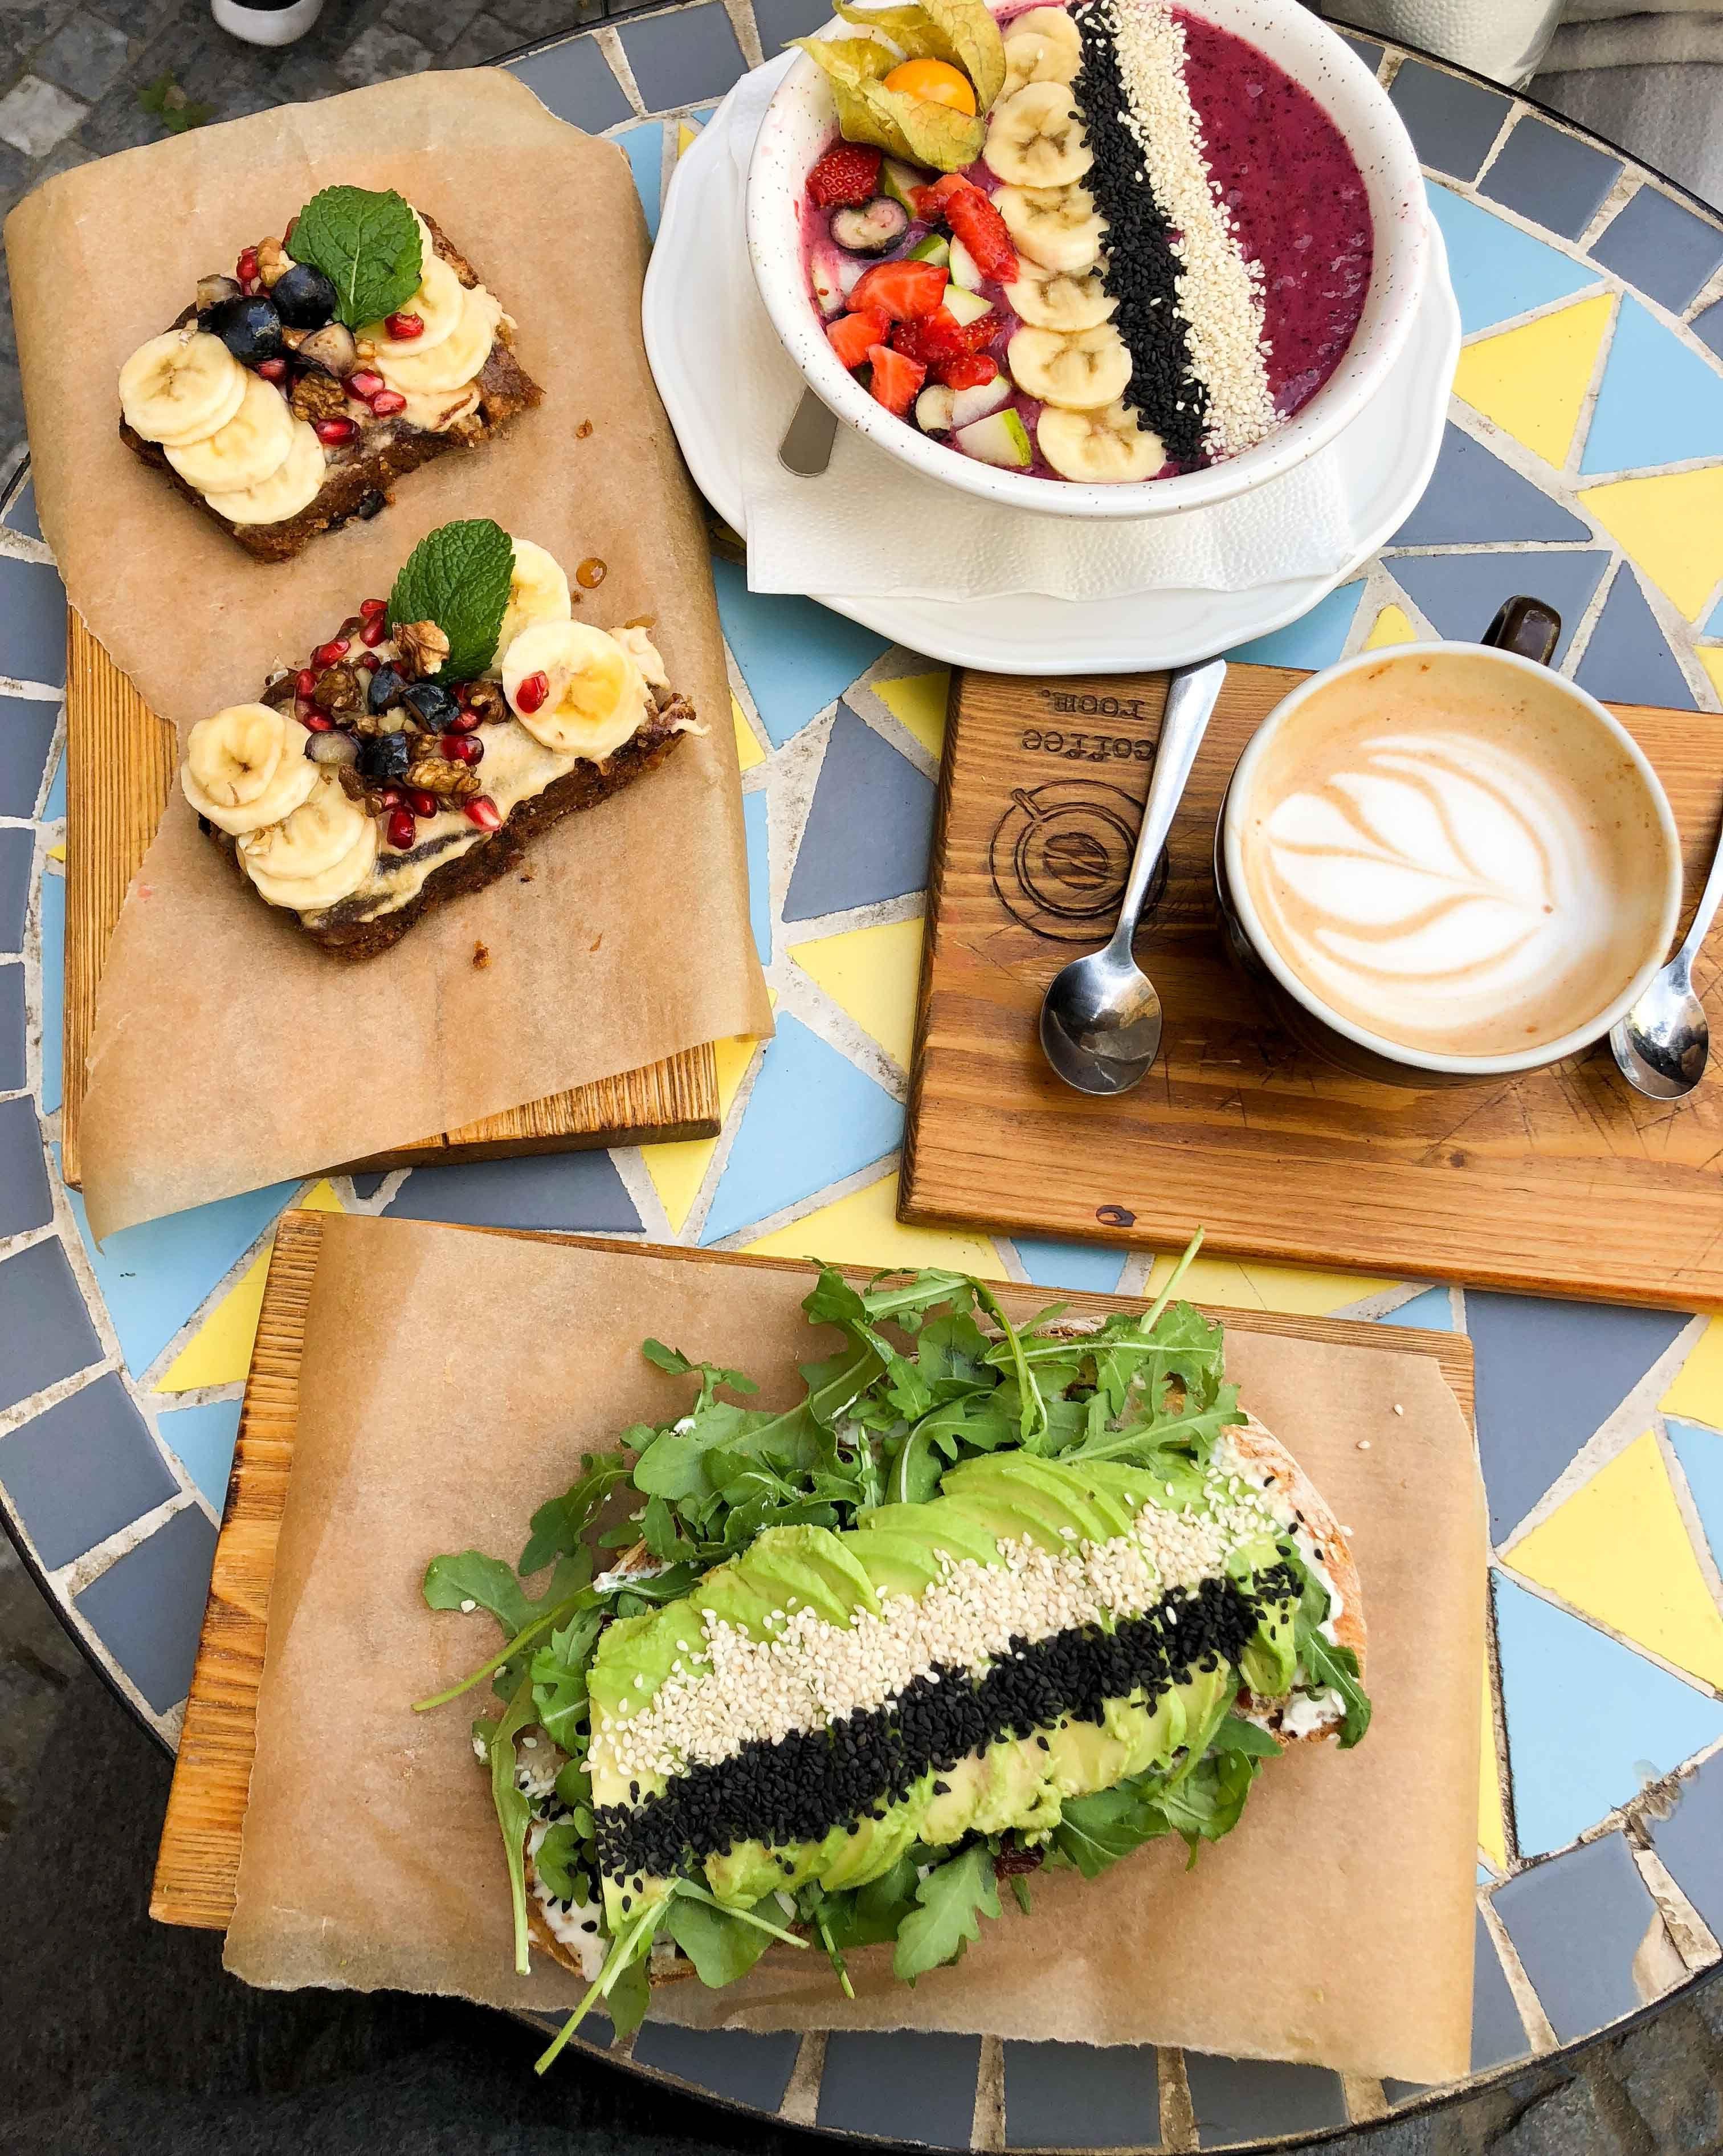 Essen in Prag   Insider Food Tipps: Frühstücksspots & Restaurants #czechfood